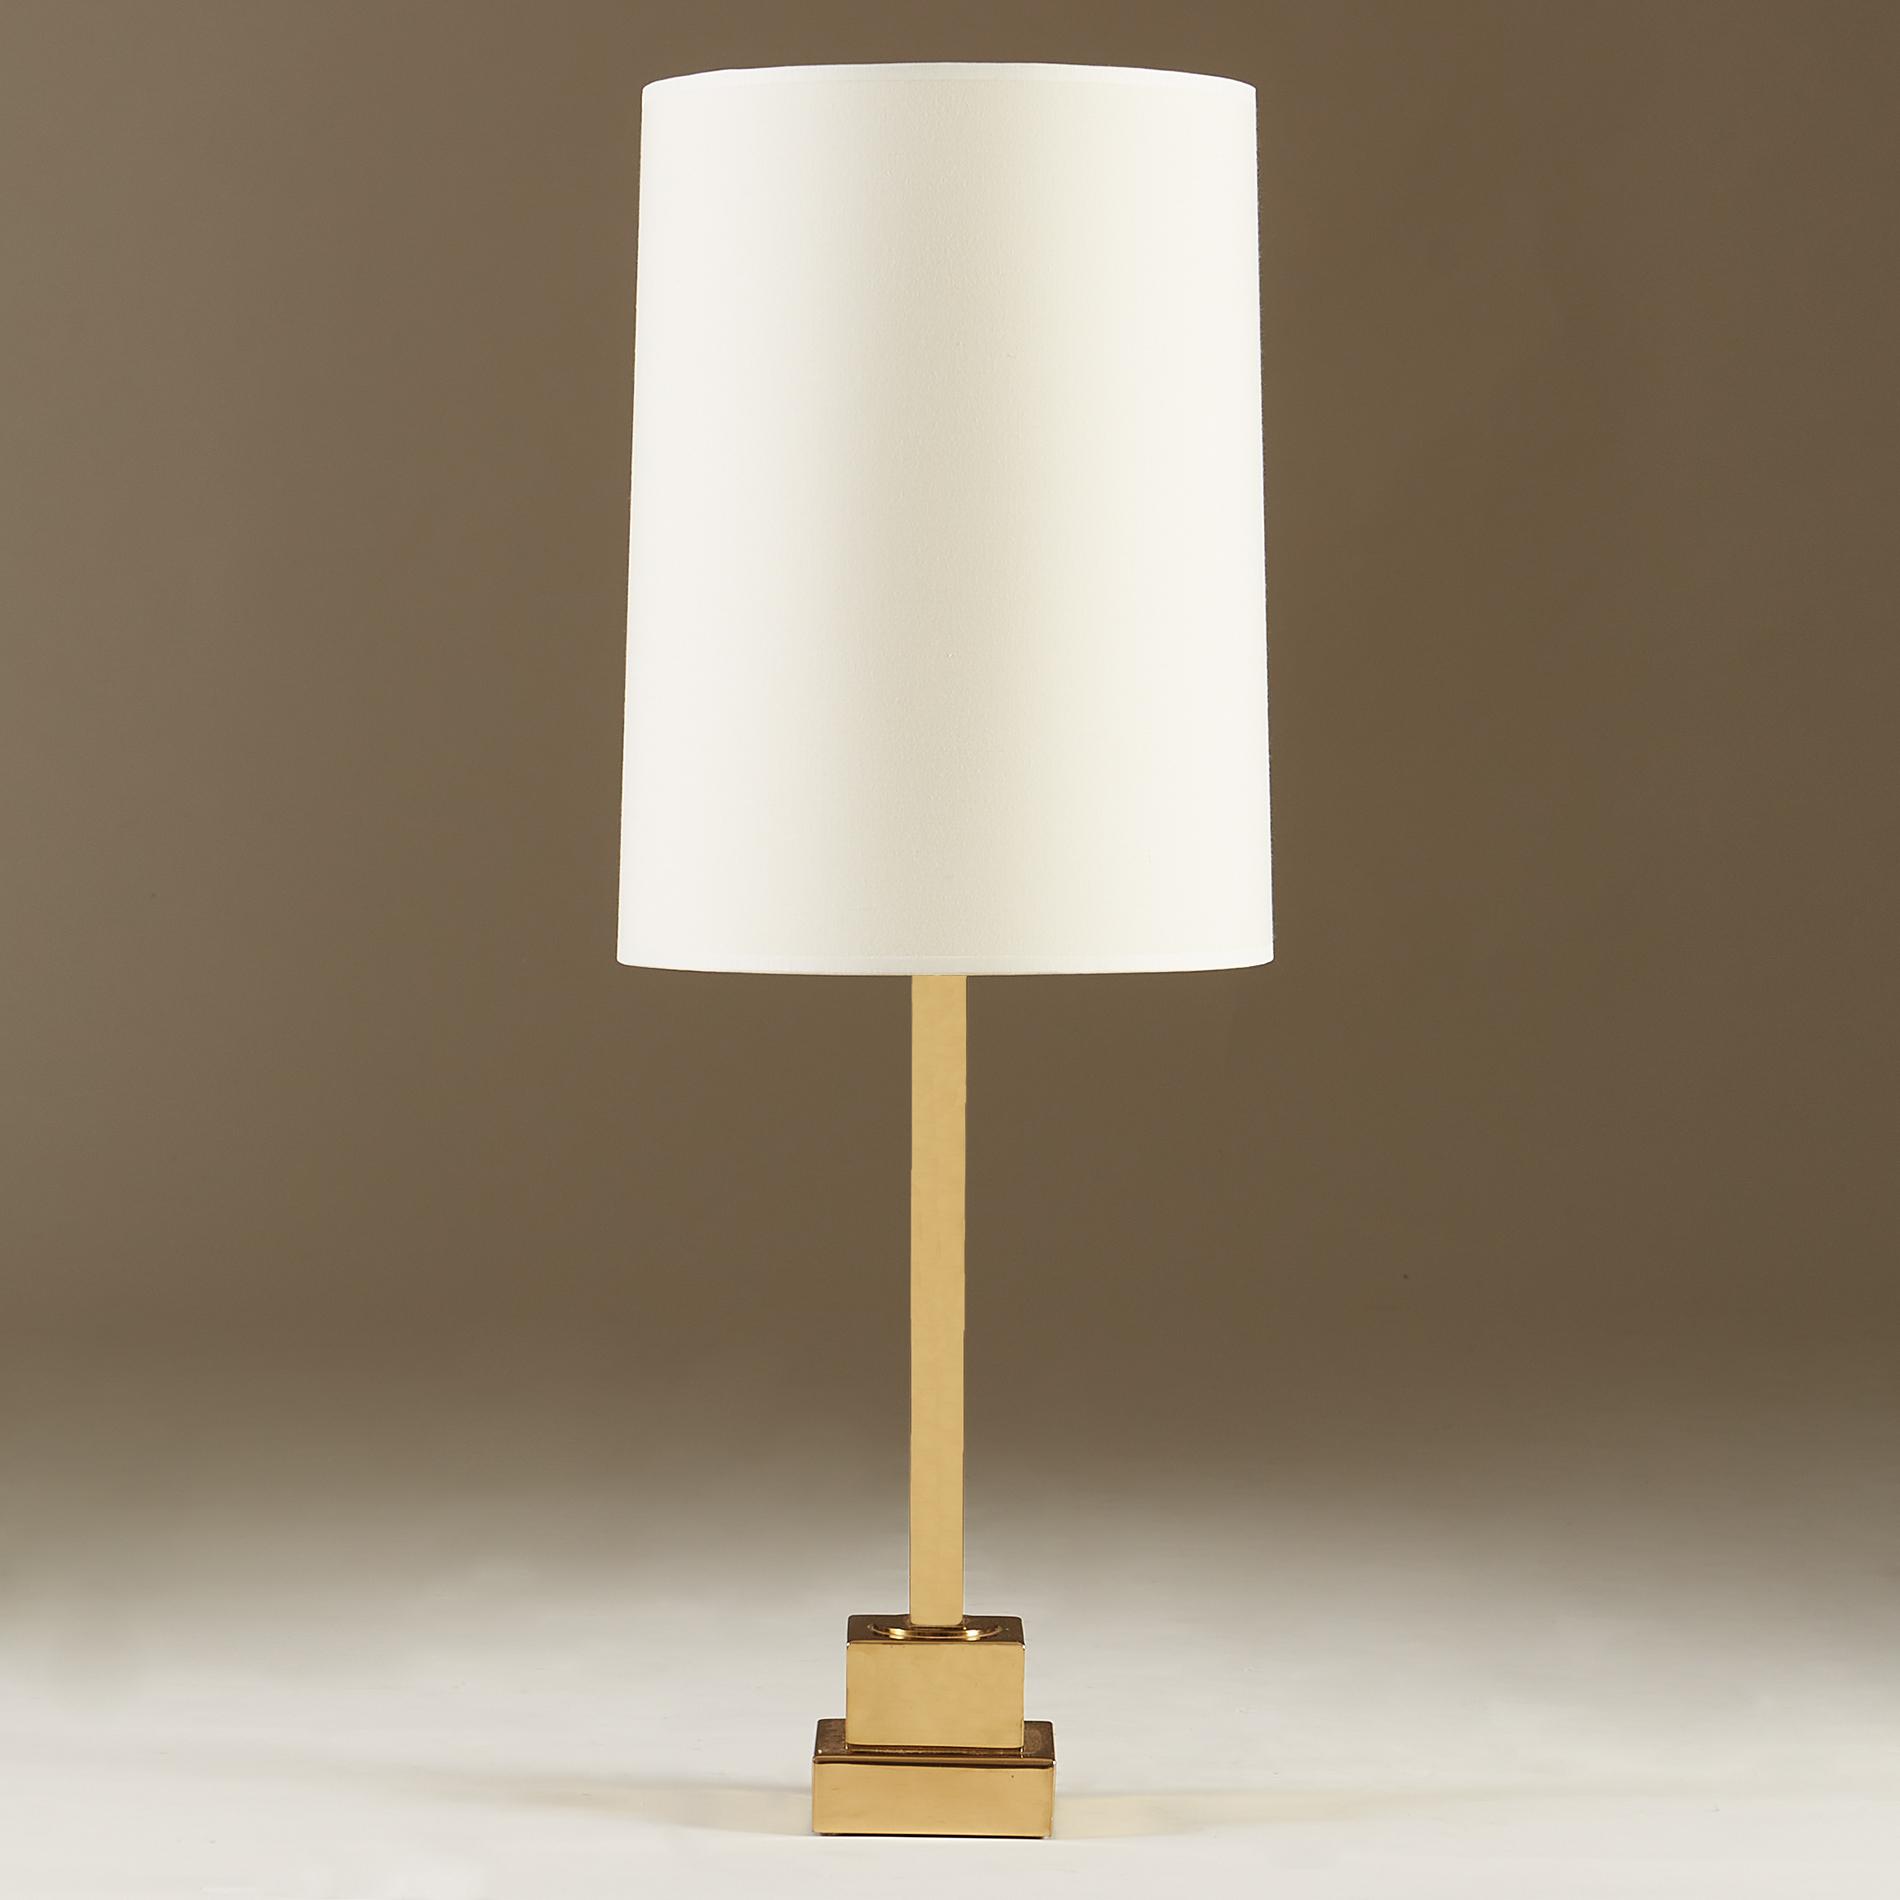 Bergbom Table Lamps 0184